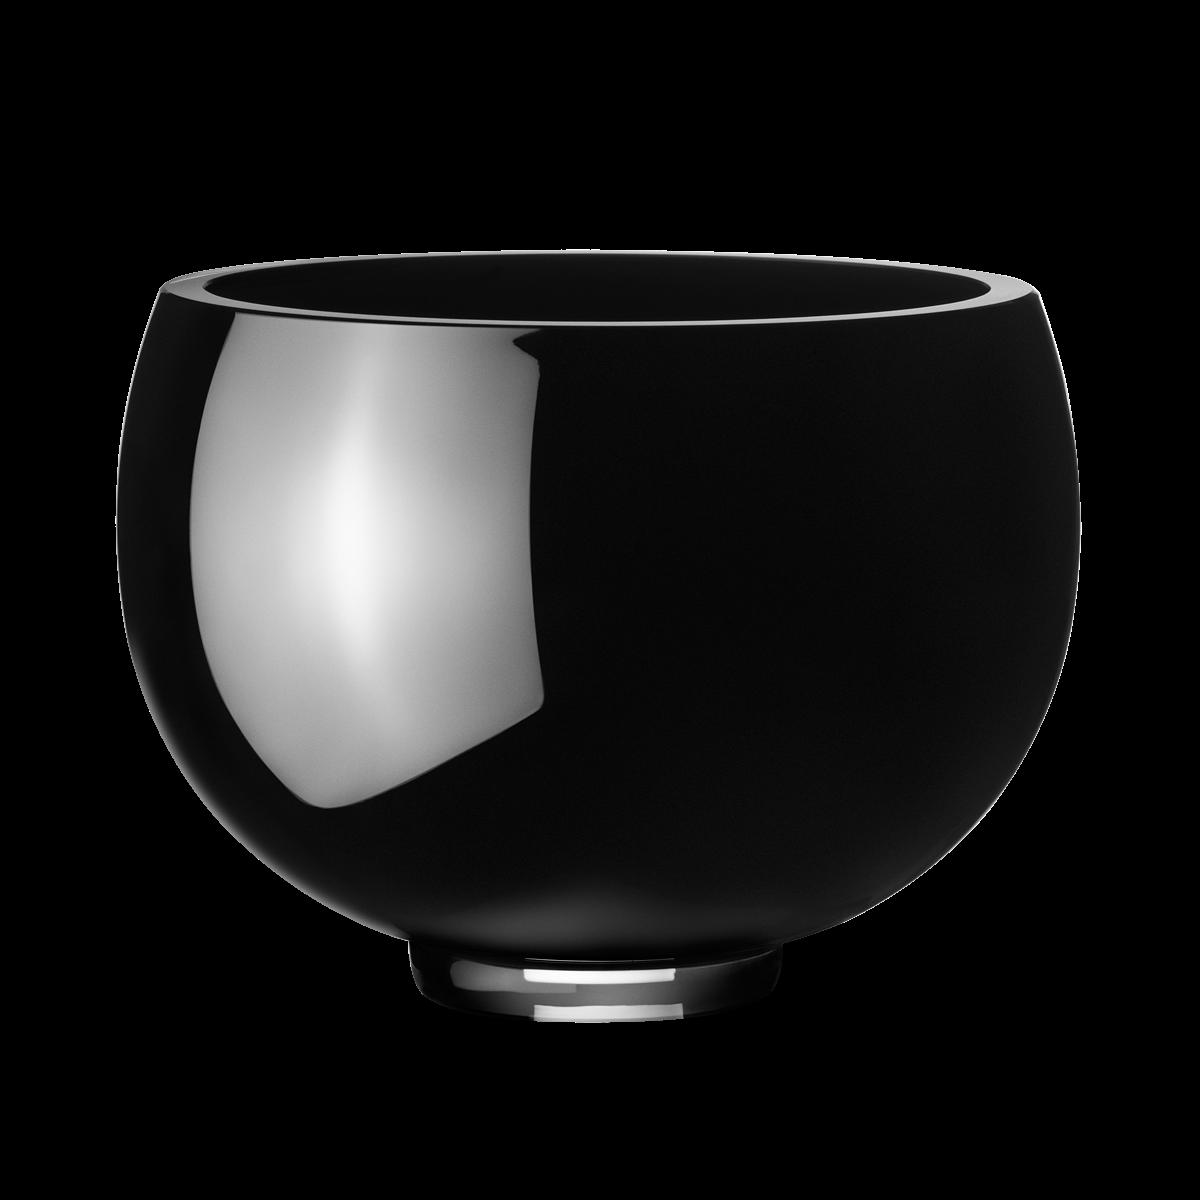 ILSE Bowl Black Glass Medium